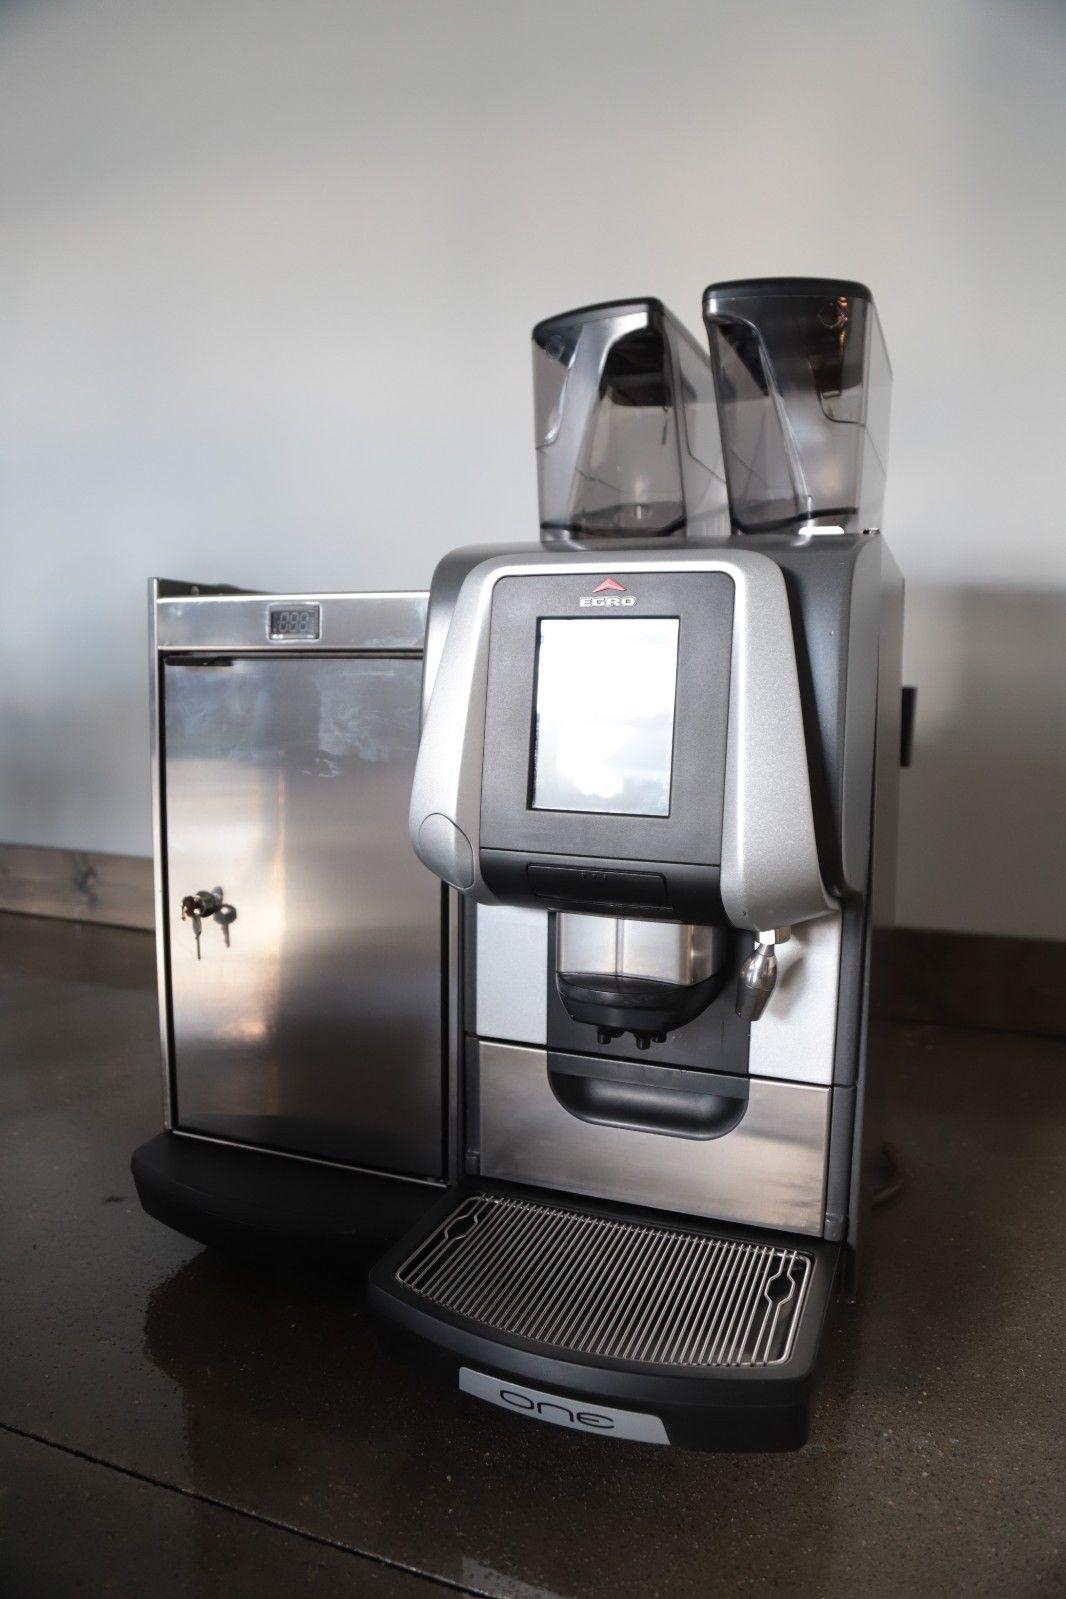 Photo Rancilio Egro One Top Milk XP Nms Automatic Commercial Espresso Machine